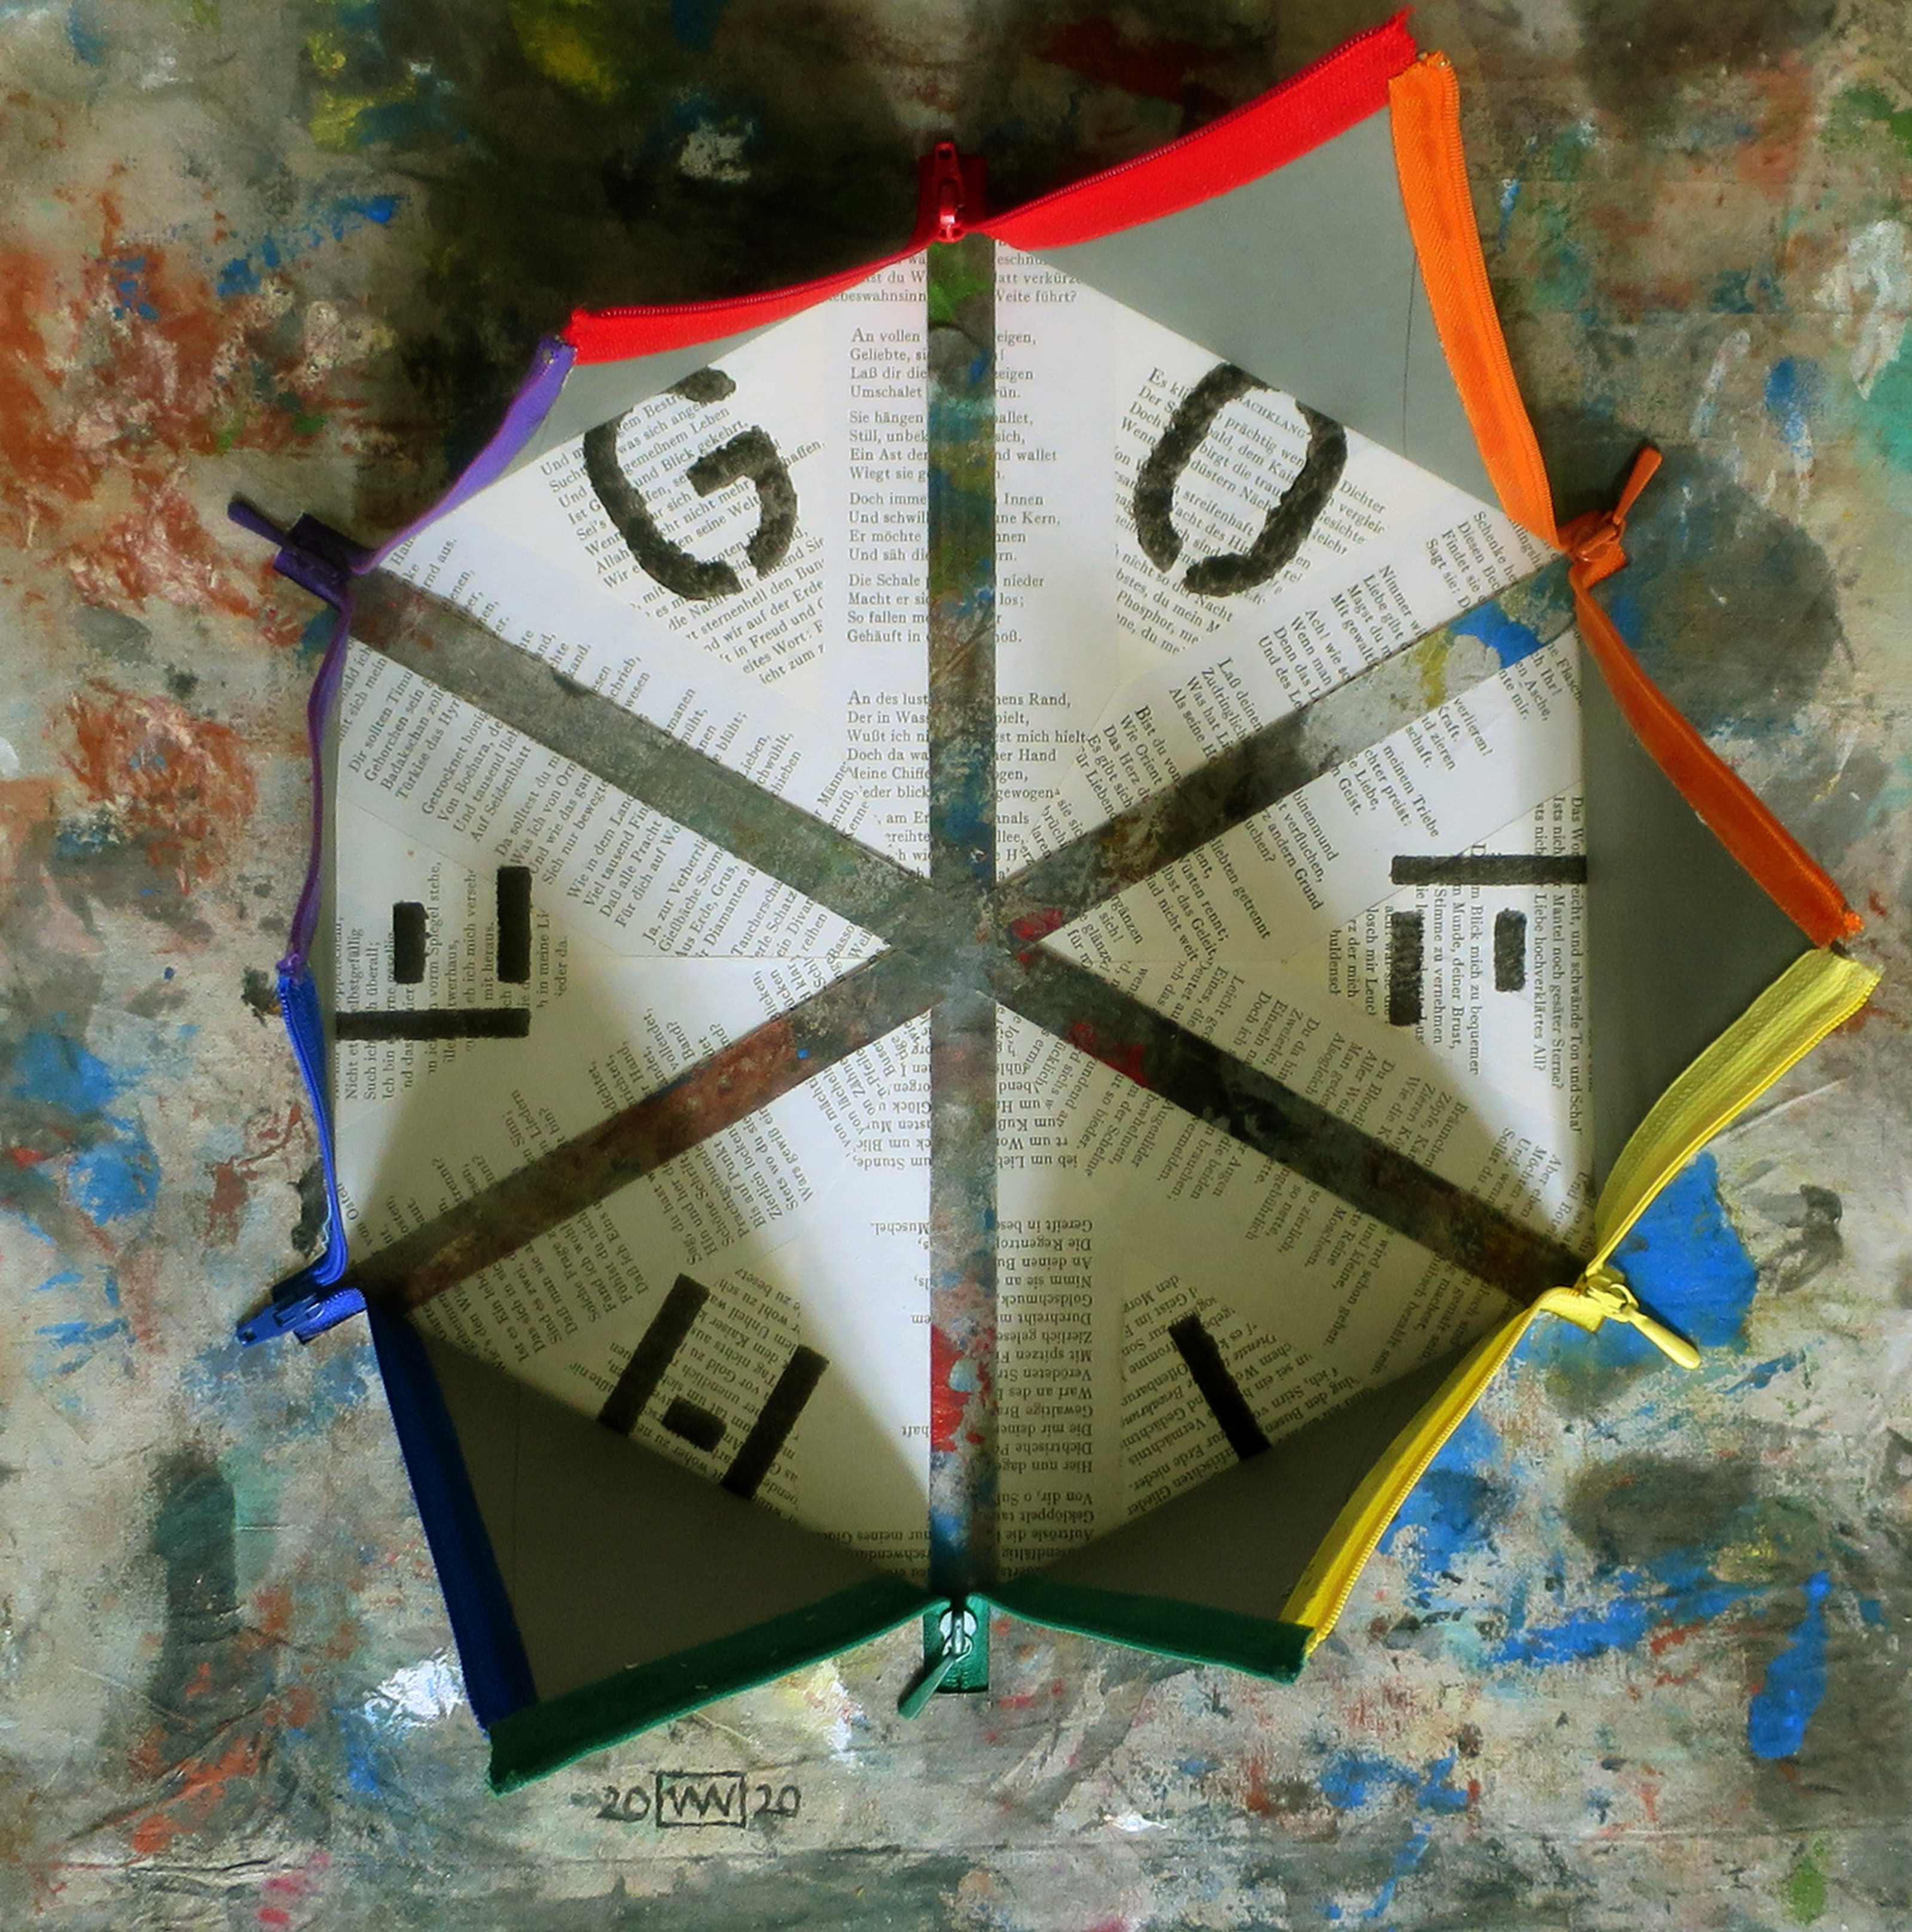 Wolfgang Nieblich_Der Goethe-Farbkreis